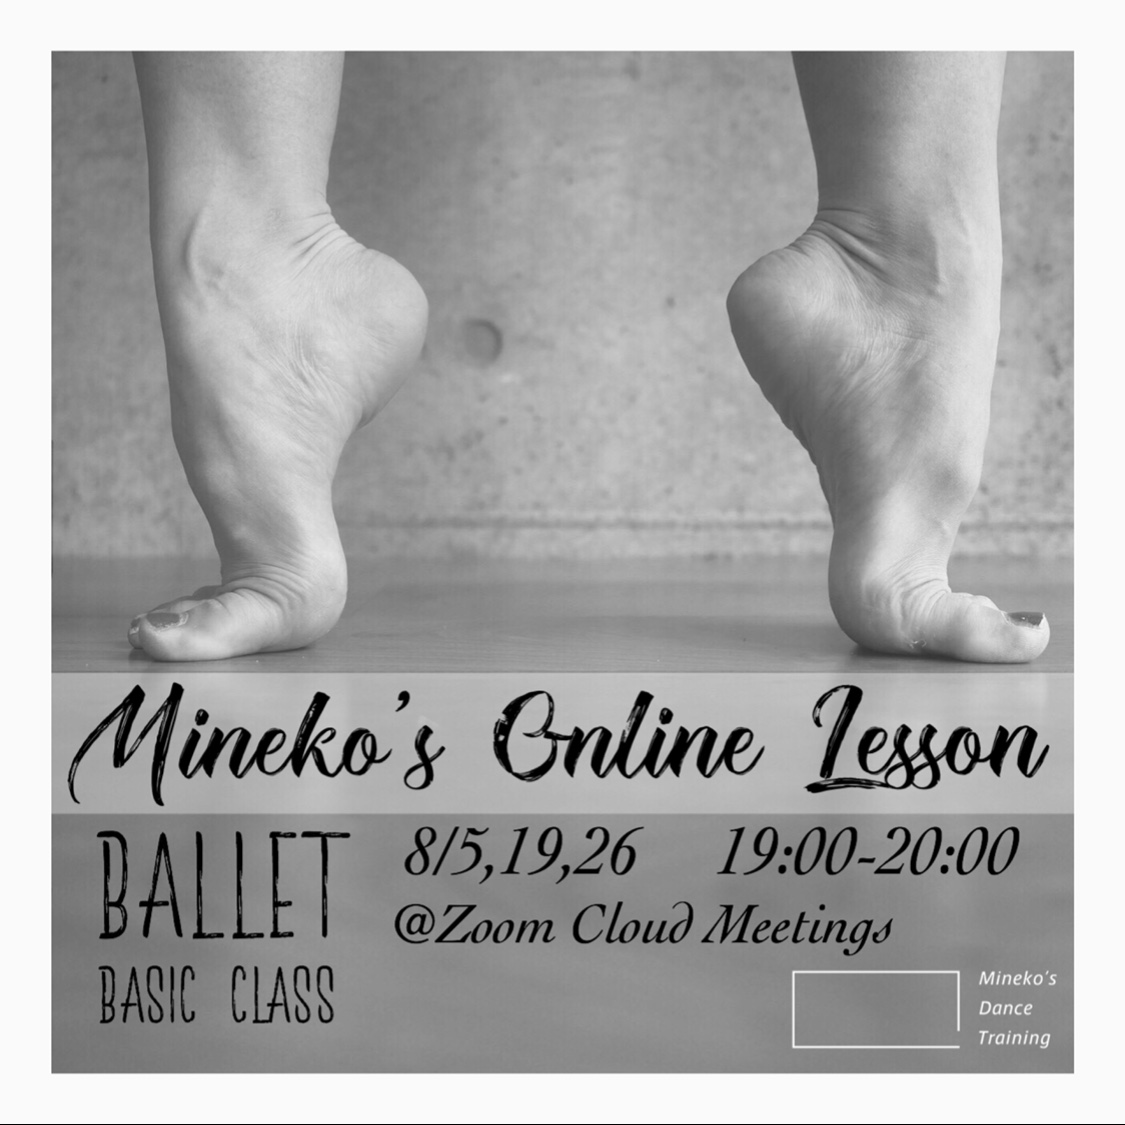 Mineko's Online Lesson〈August〉